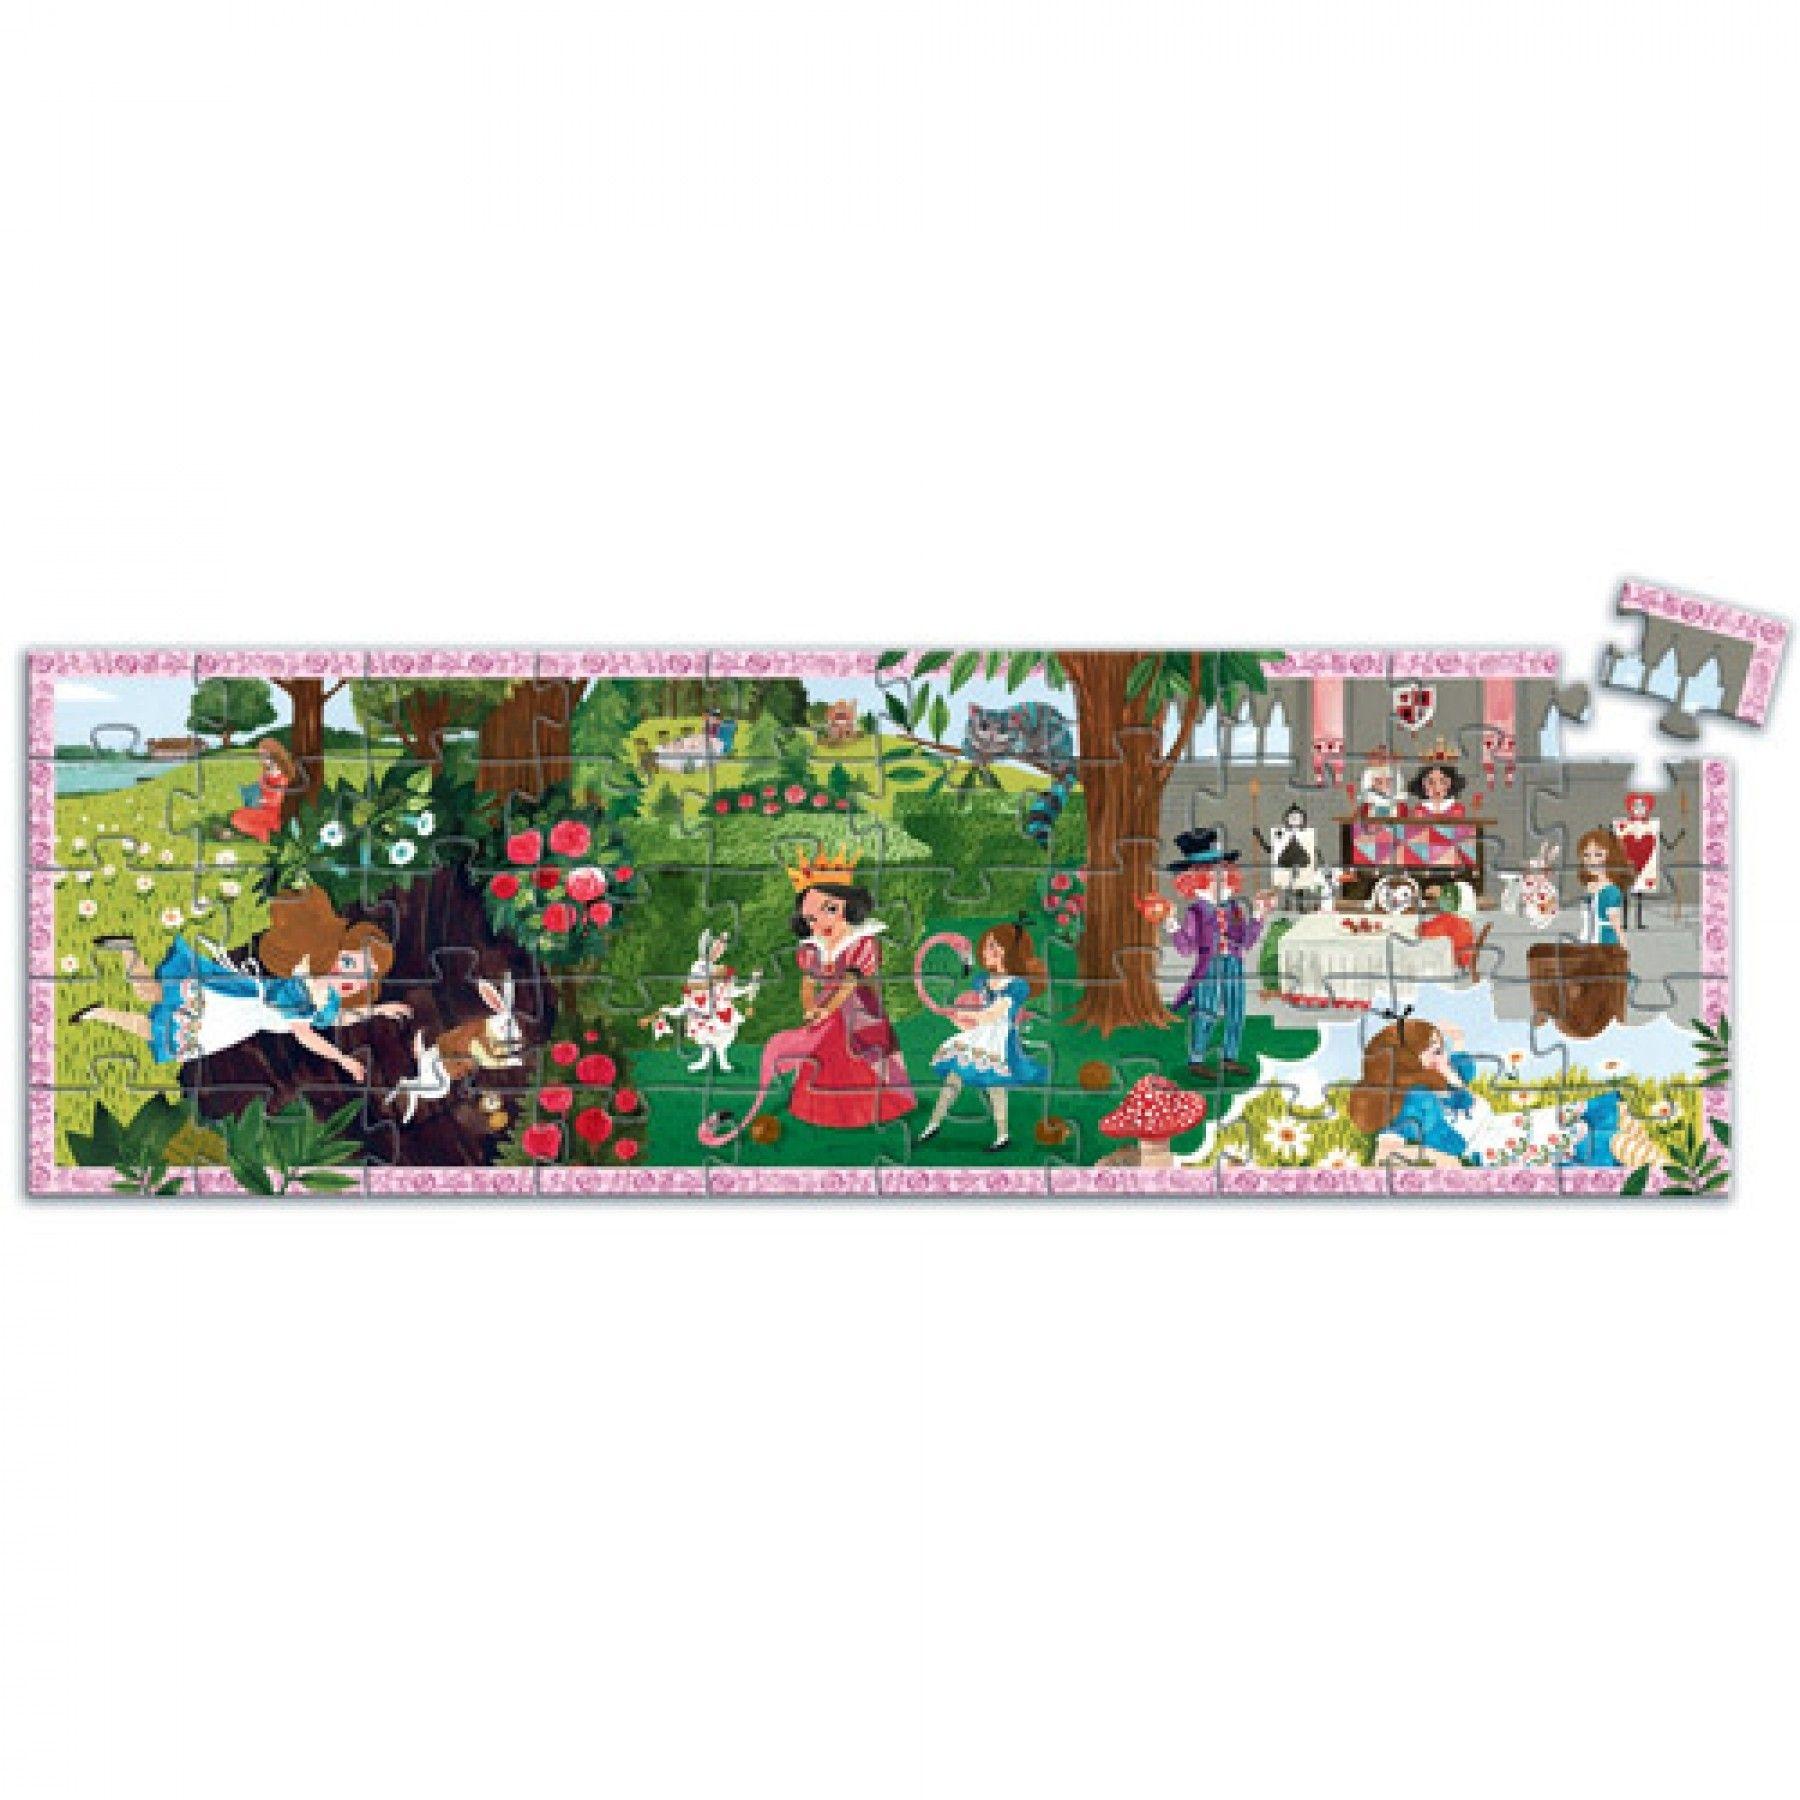 Djeco Djeco Puzzel - Alice in Wonderland 50pcs 5y+